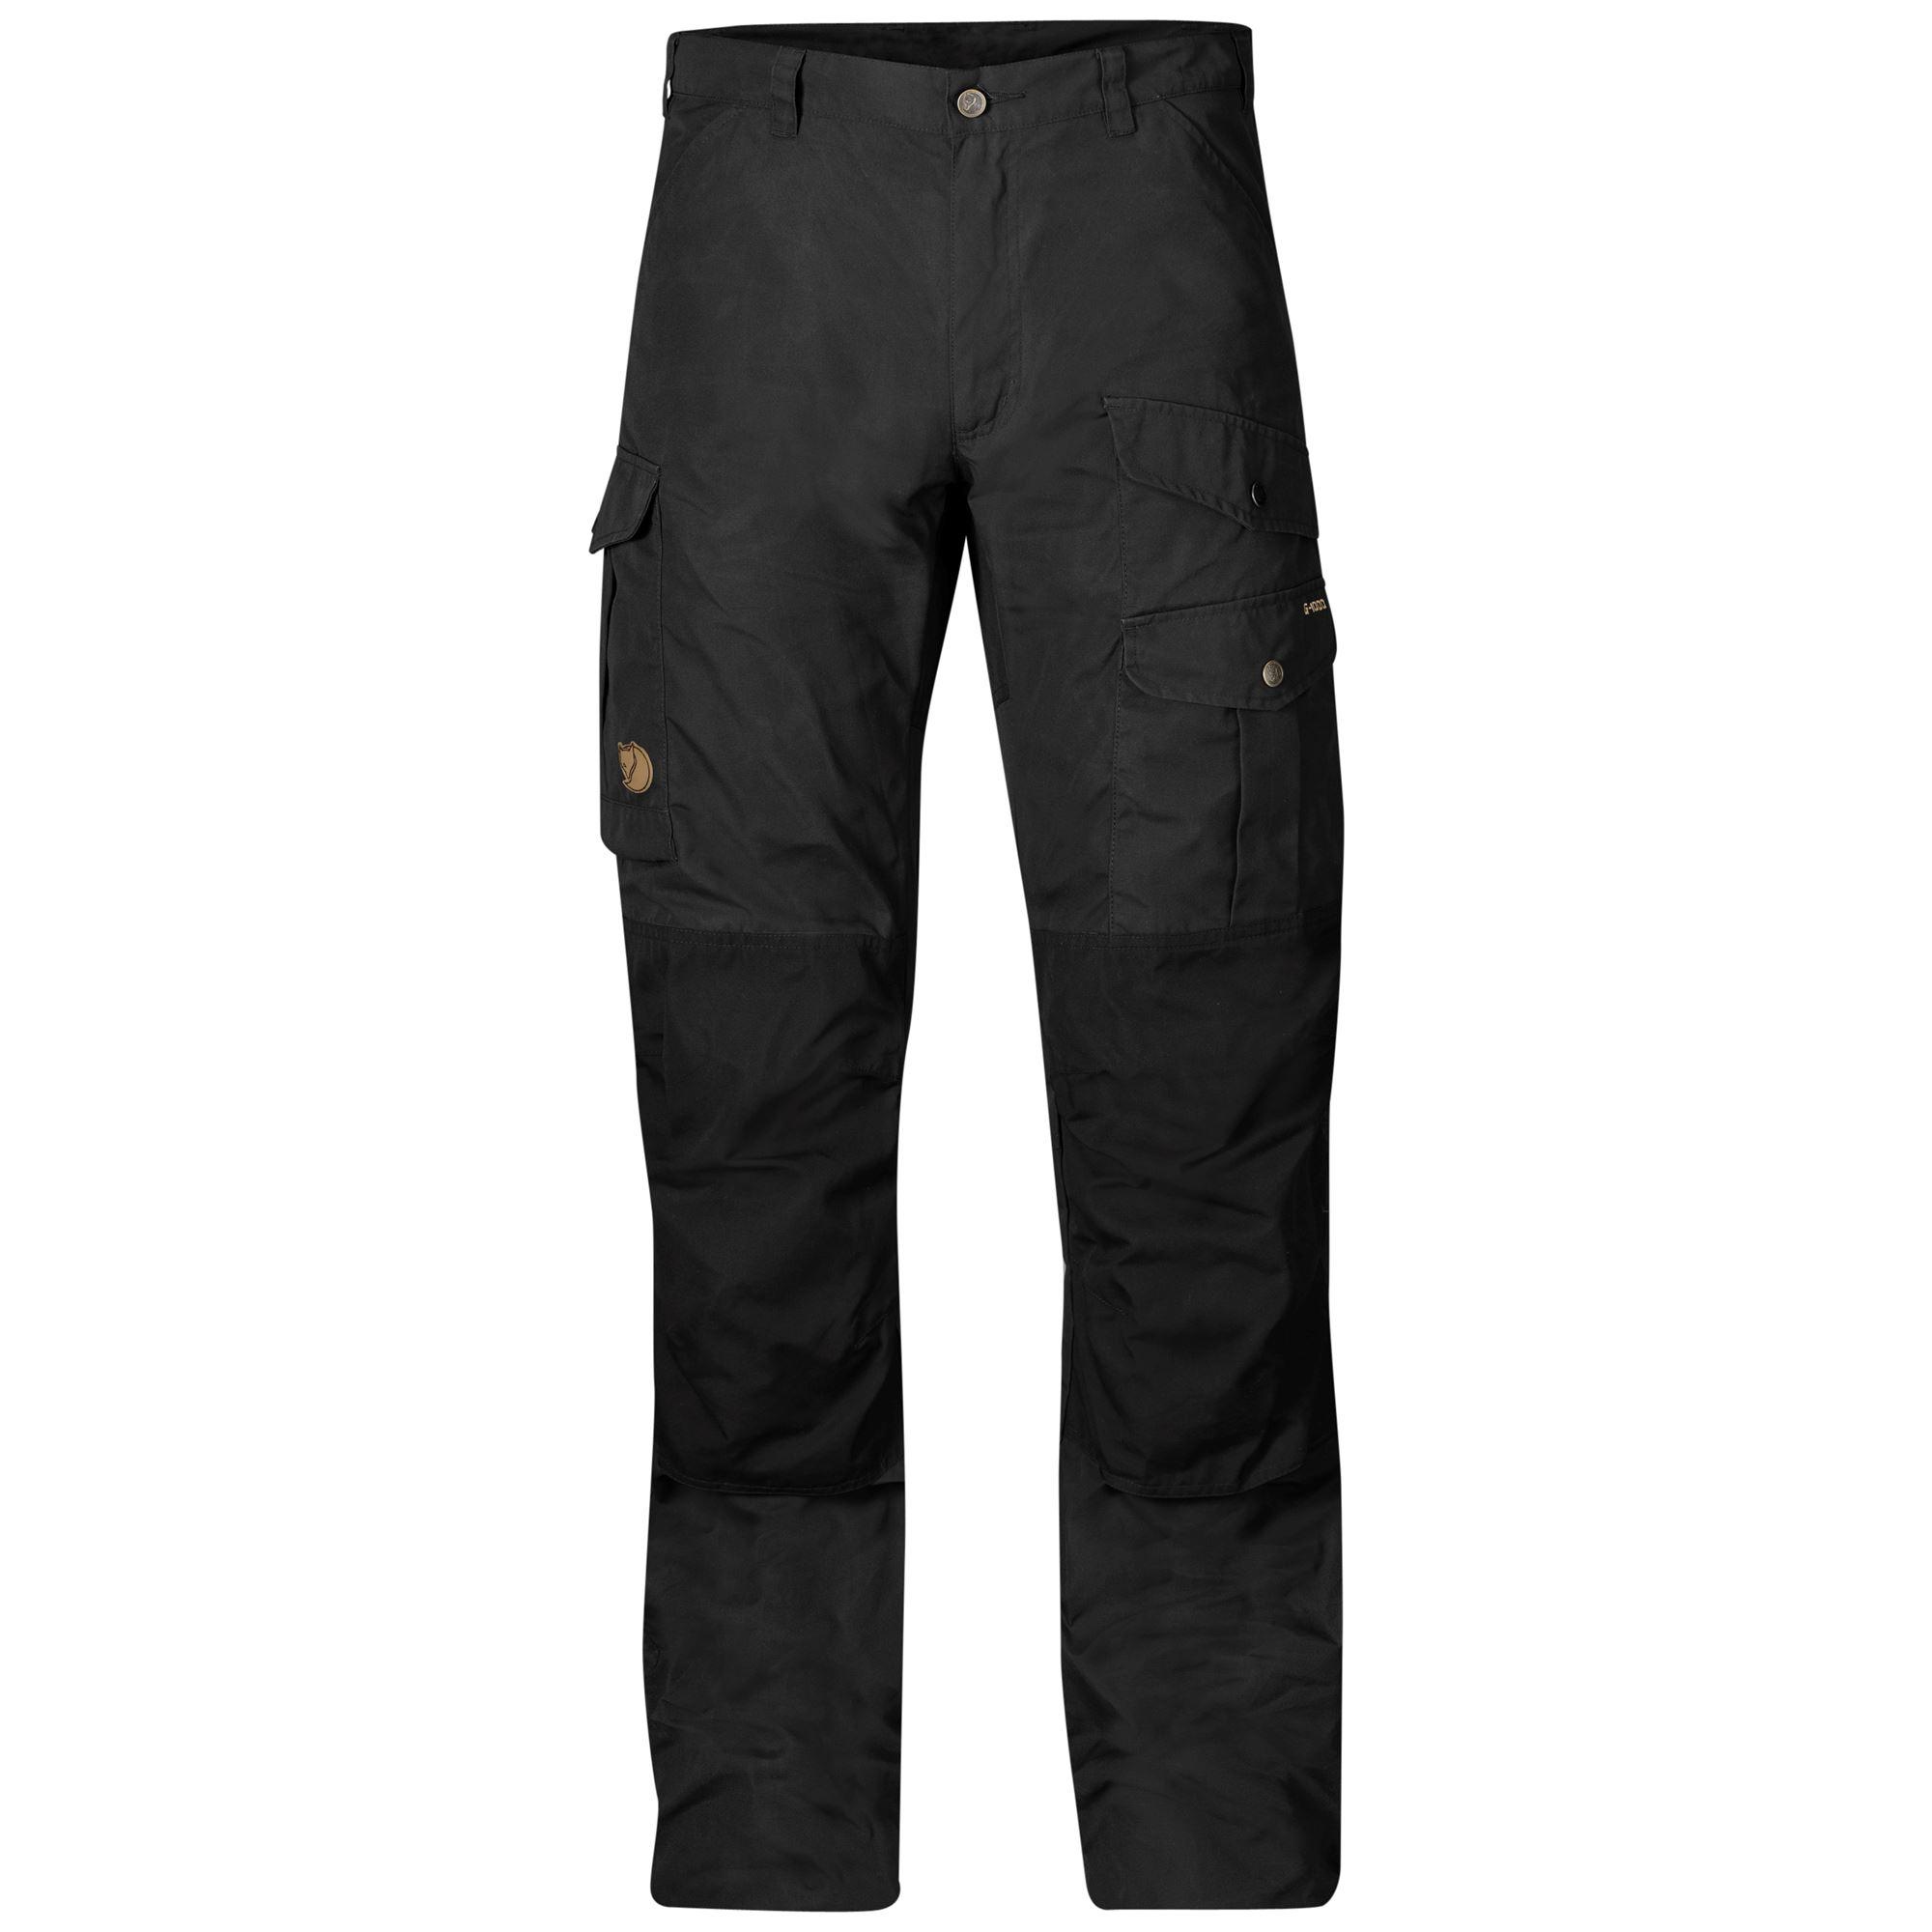 Fjällräven - Barents Pro Trousers - Outdoor trousers - Men's